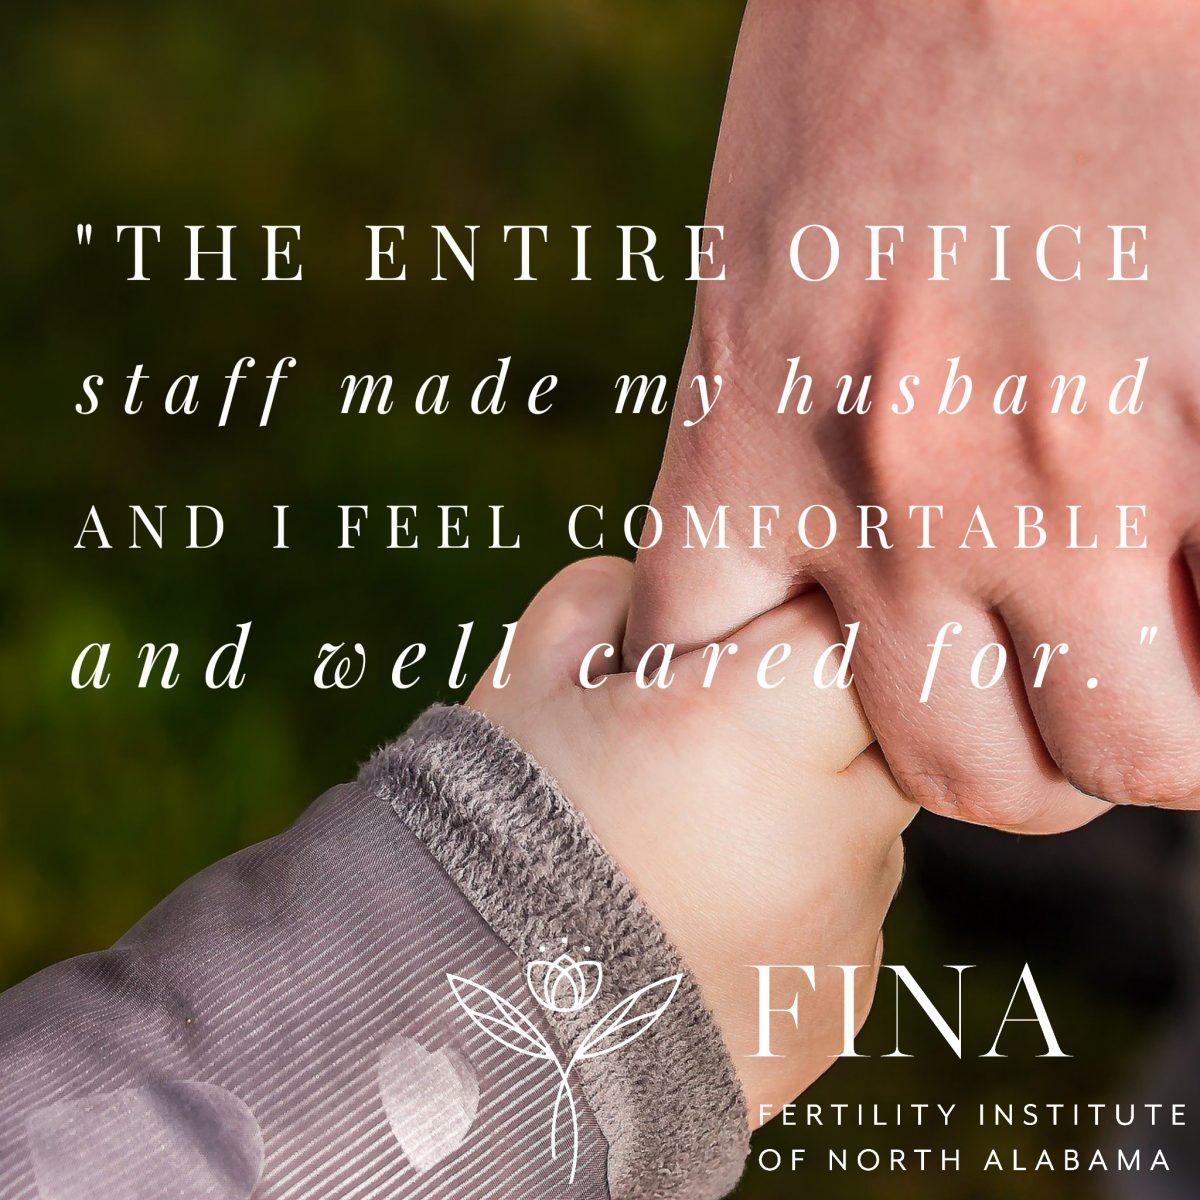 A Patient's FINA story…